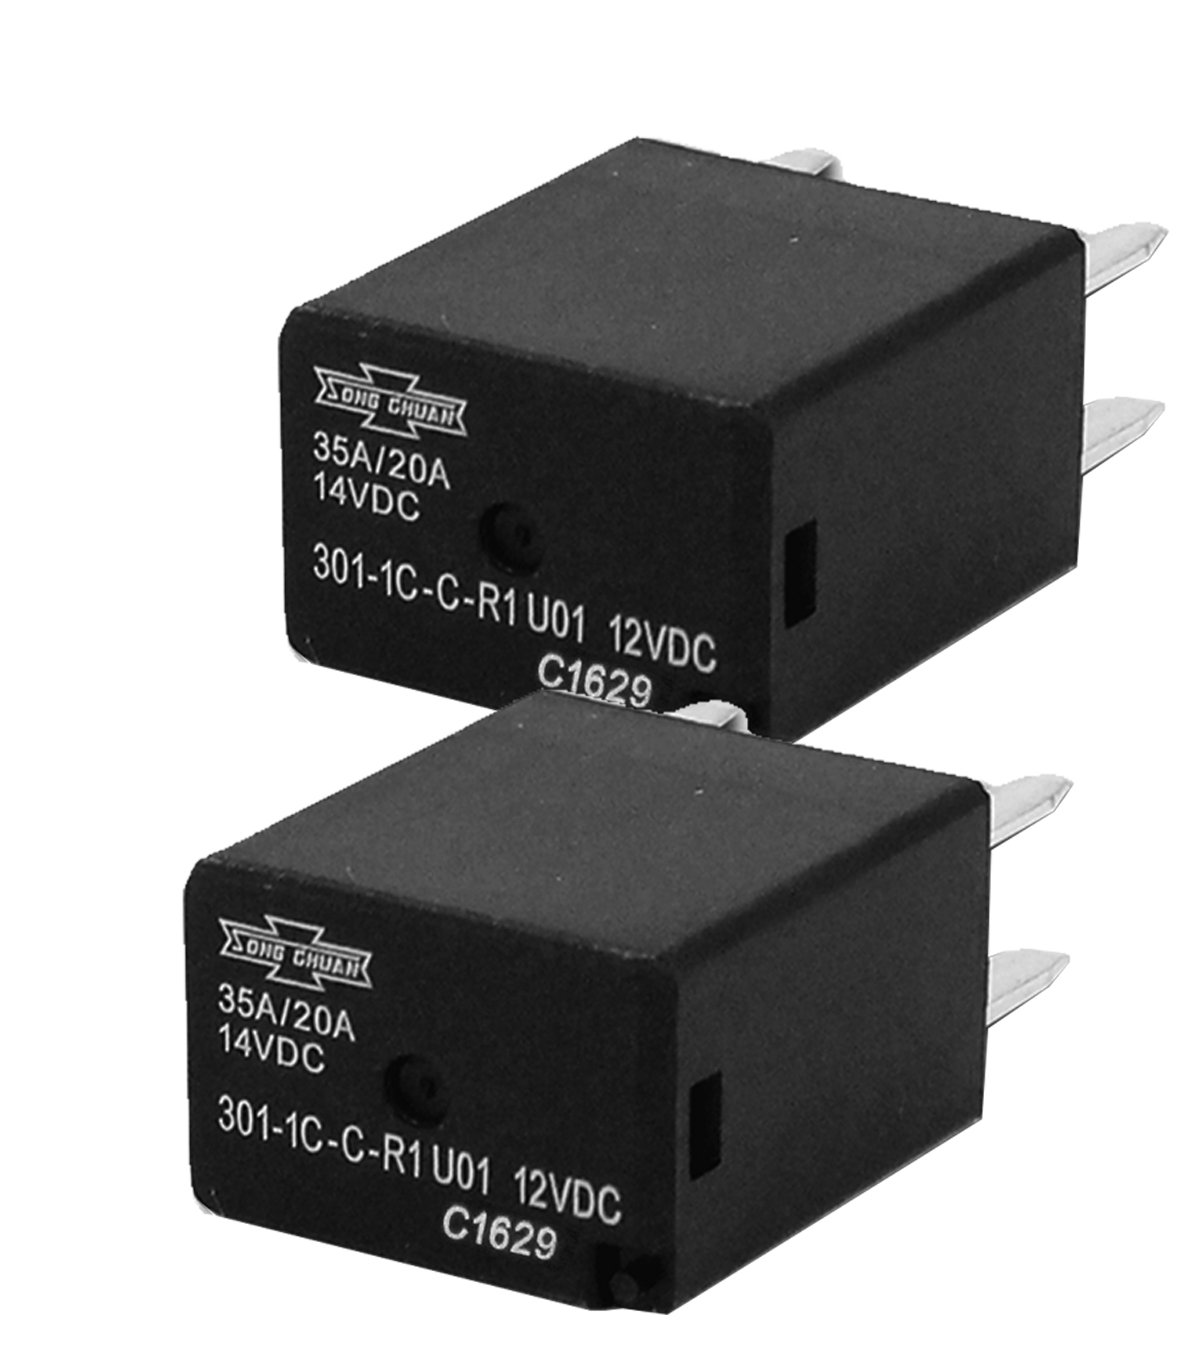 Amazon.com: Song Chuan Automotive Relays SPDT 35A 12VDC ( Pack of 2 ):  Industrial & Scientific